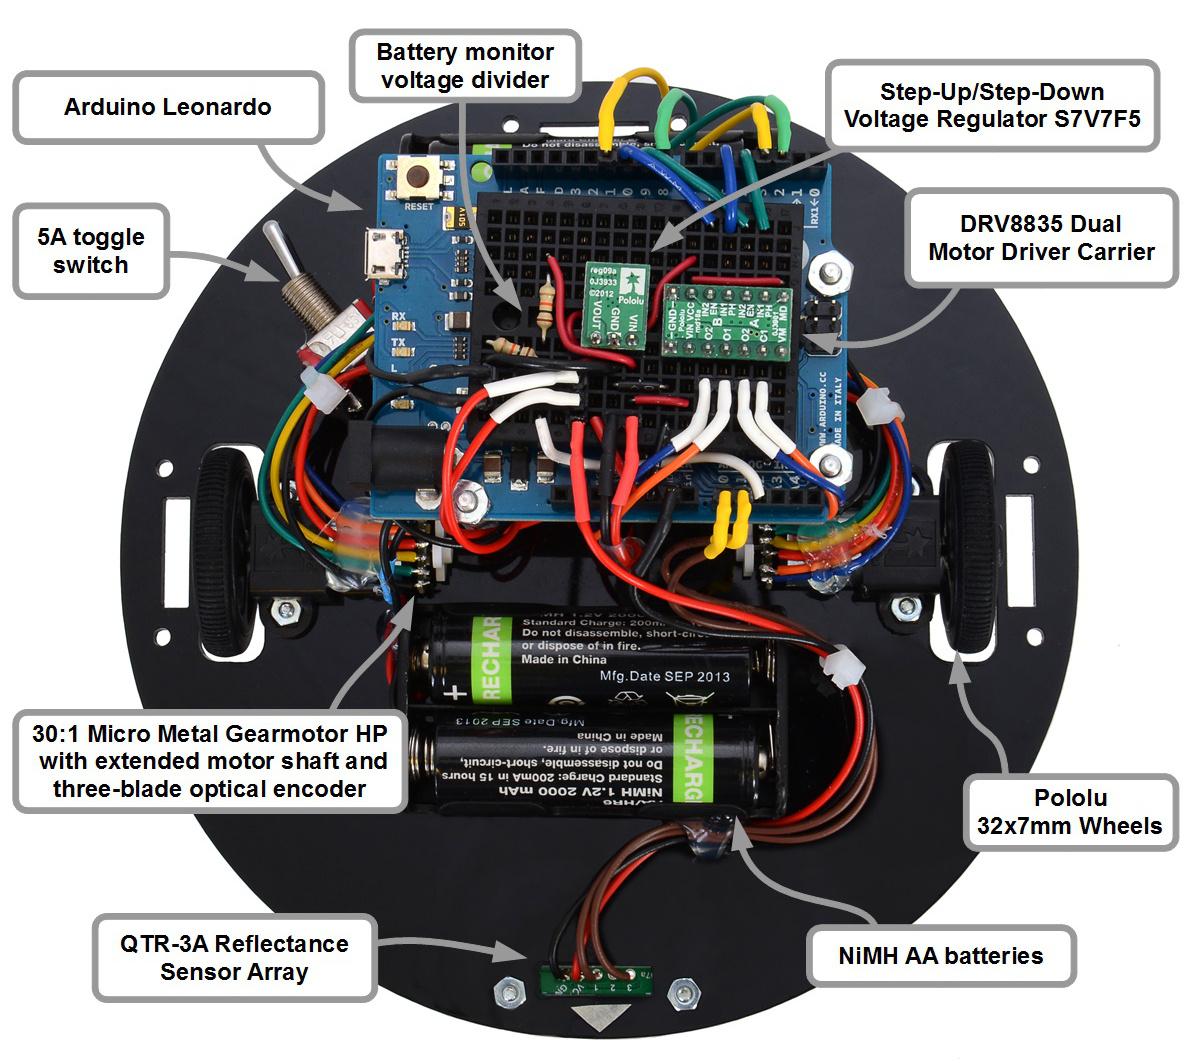 Pololu Pauls Dead Reckoning Robot Rrsspdt Spdt Round Rocker Switch Top View Of Paul Reckoning288ec5df